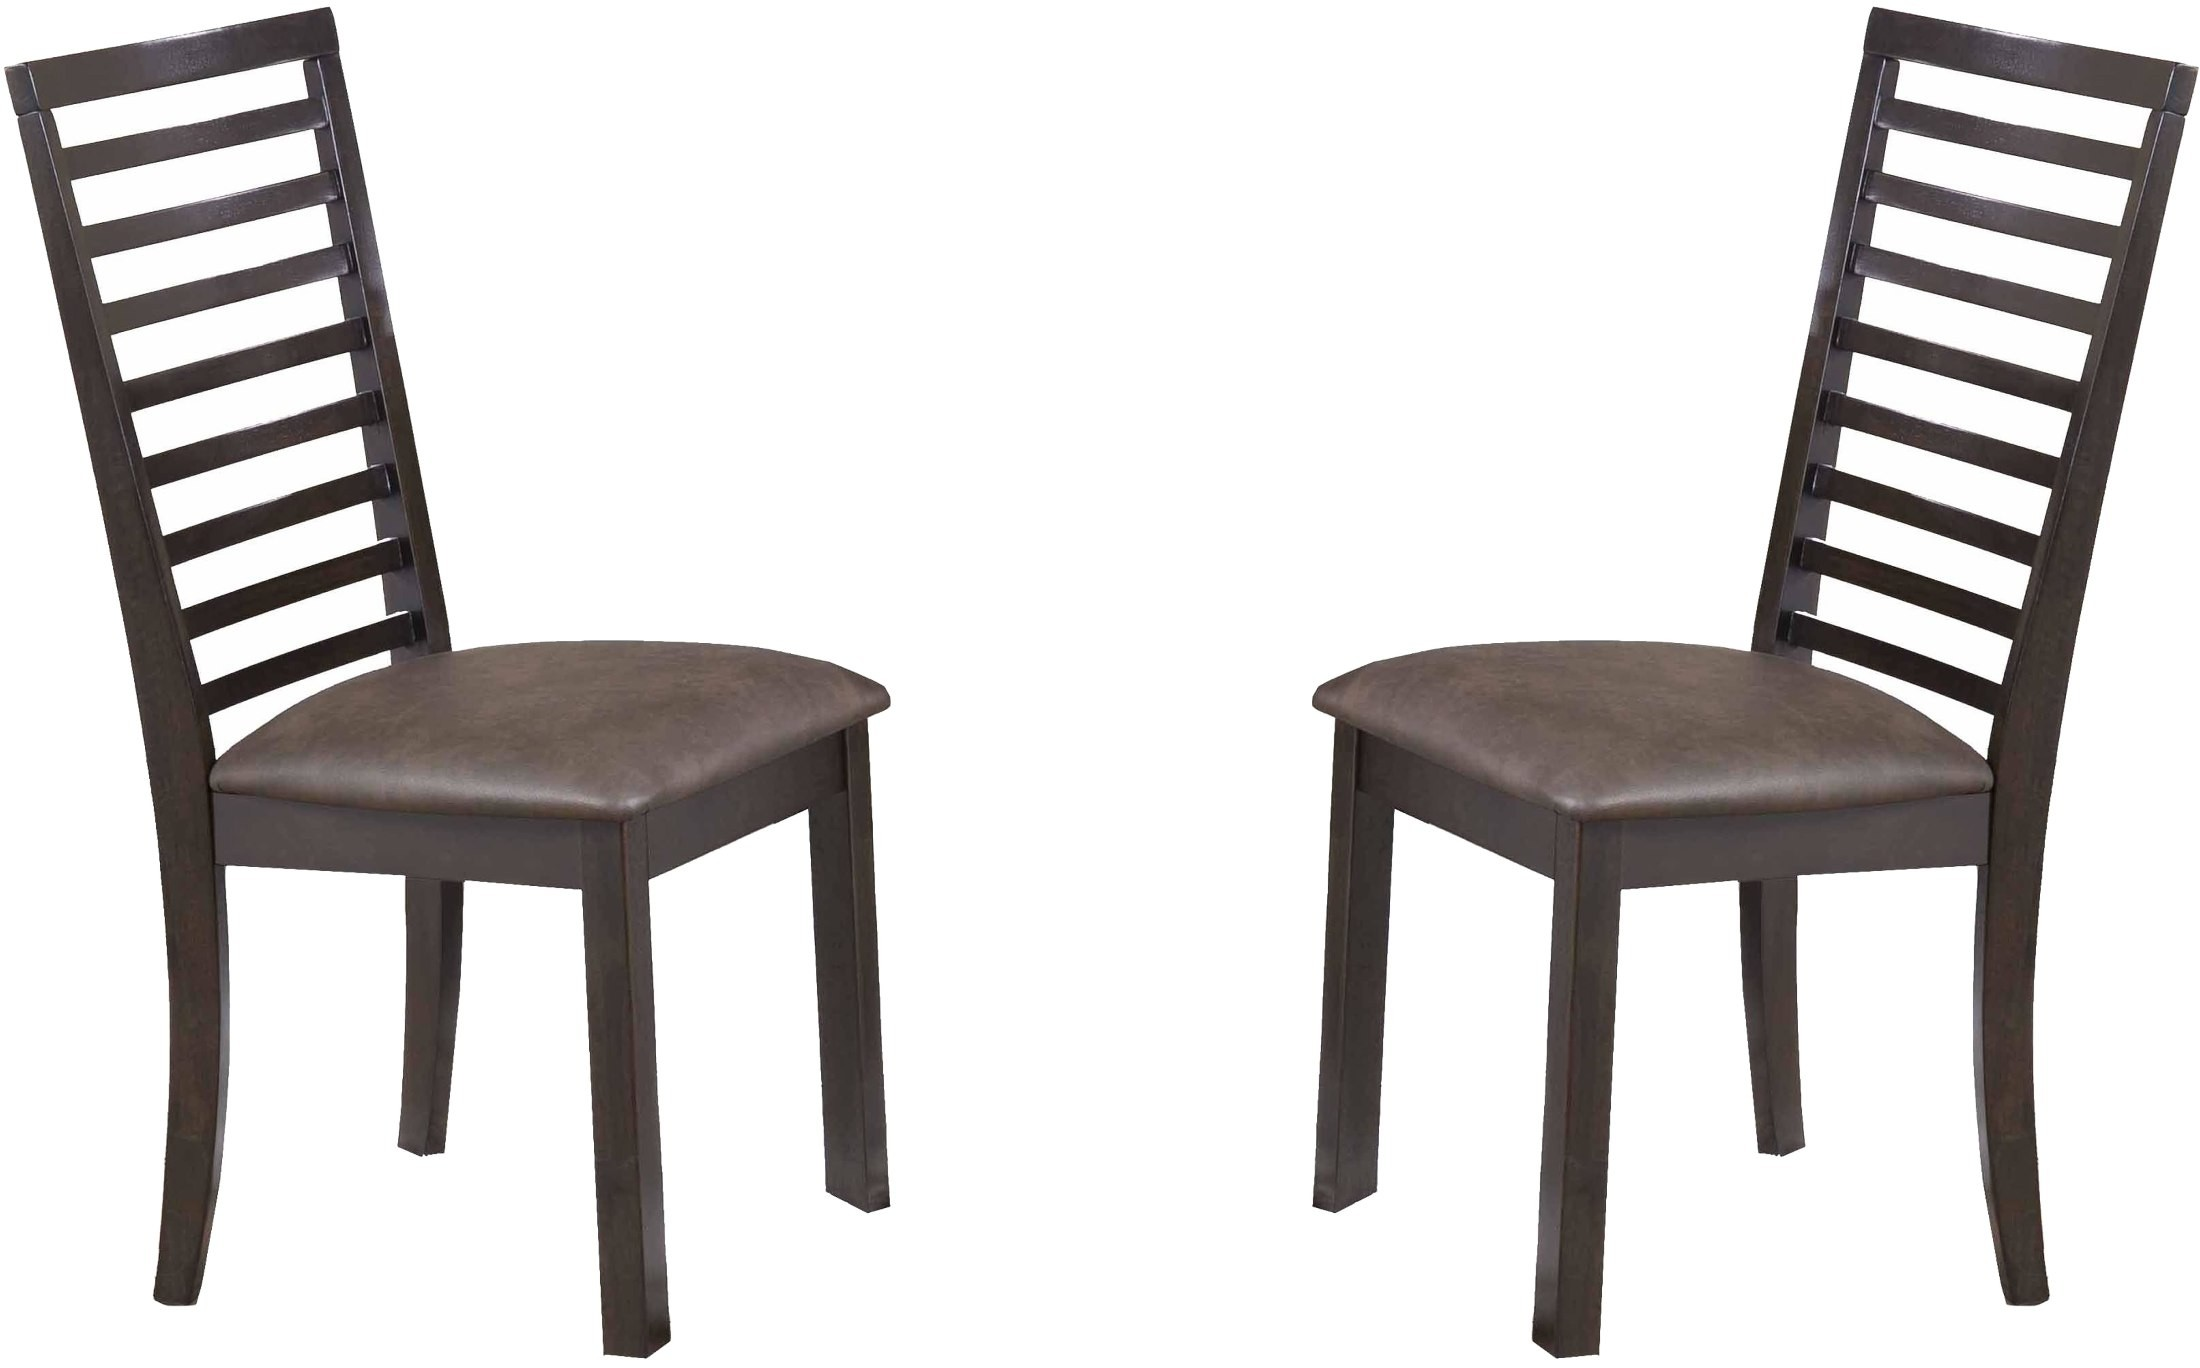 manhattan jacobean walnut dining chair set of 2 5442 00 s